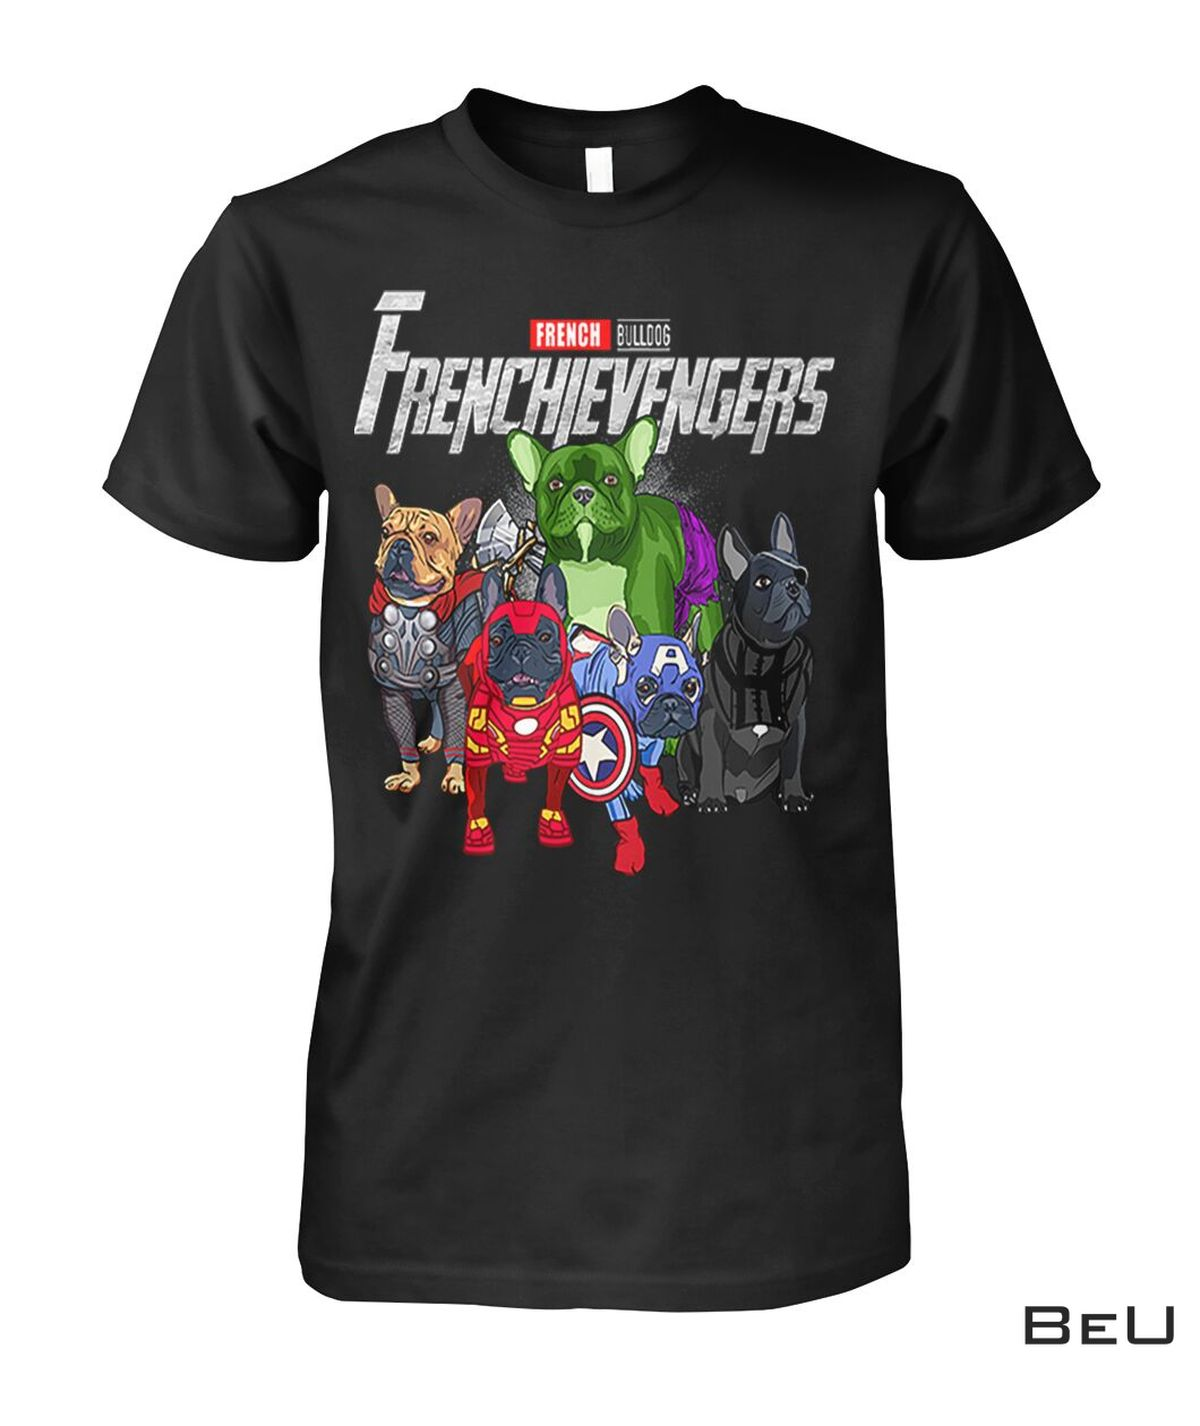 French Bulldog Frenchievengers Avengers Shirt